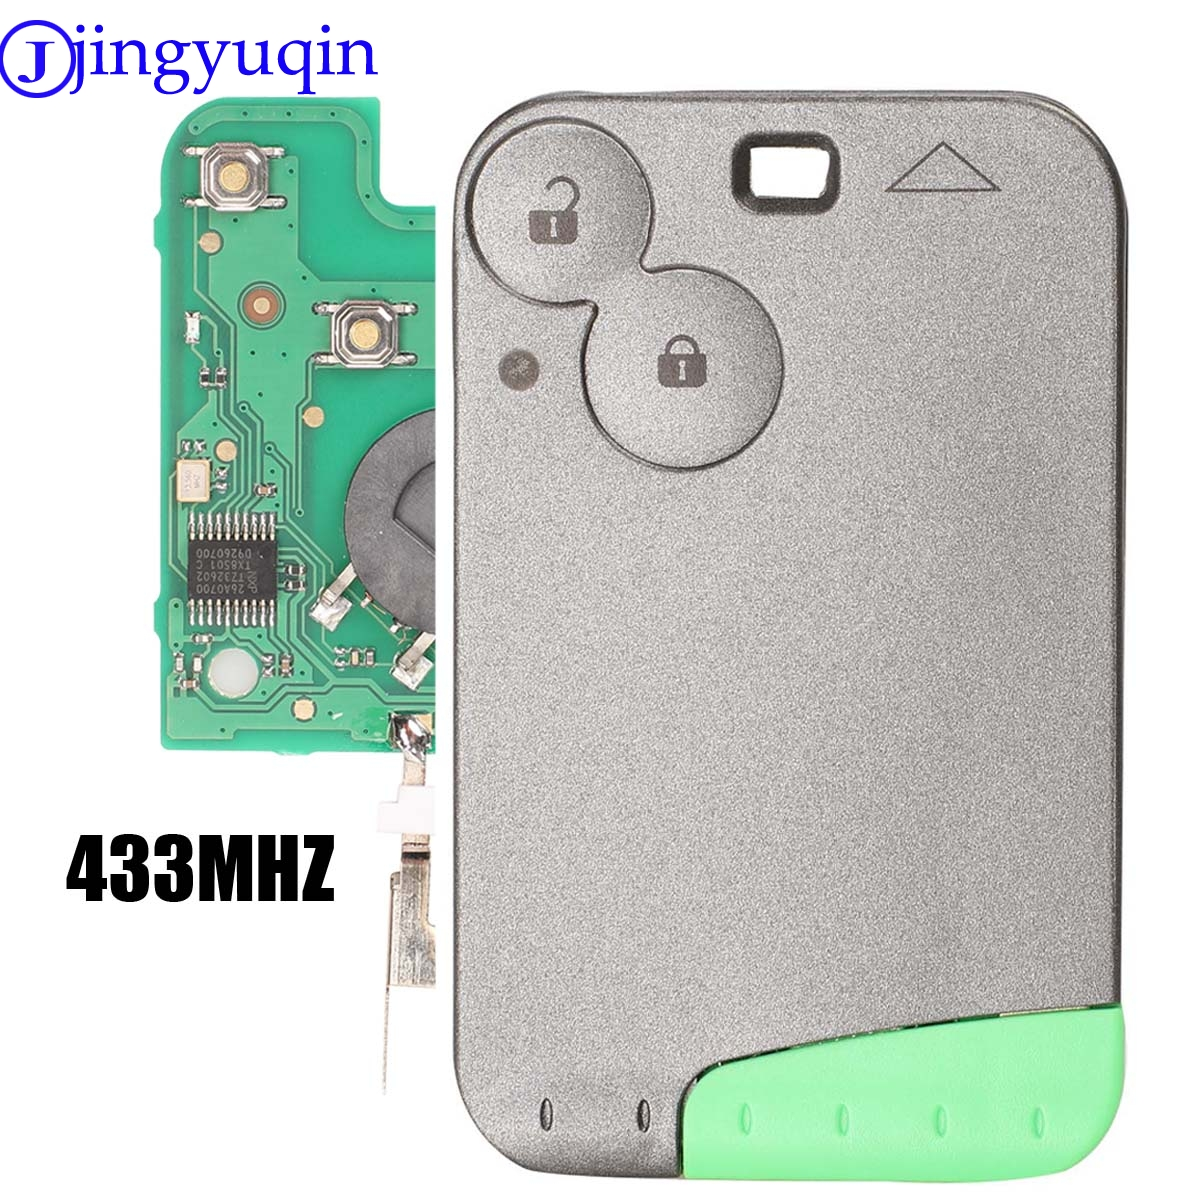 jingyuqin 10p 433 MHz Pcf7947 Chip 2 Button Remote Card Smart Car Key for Renault Laguna